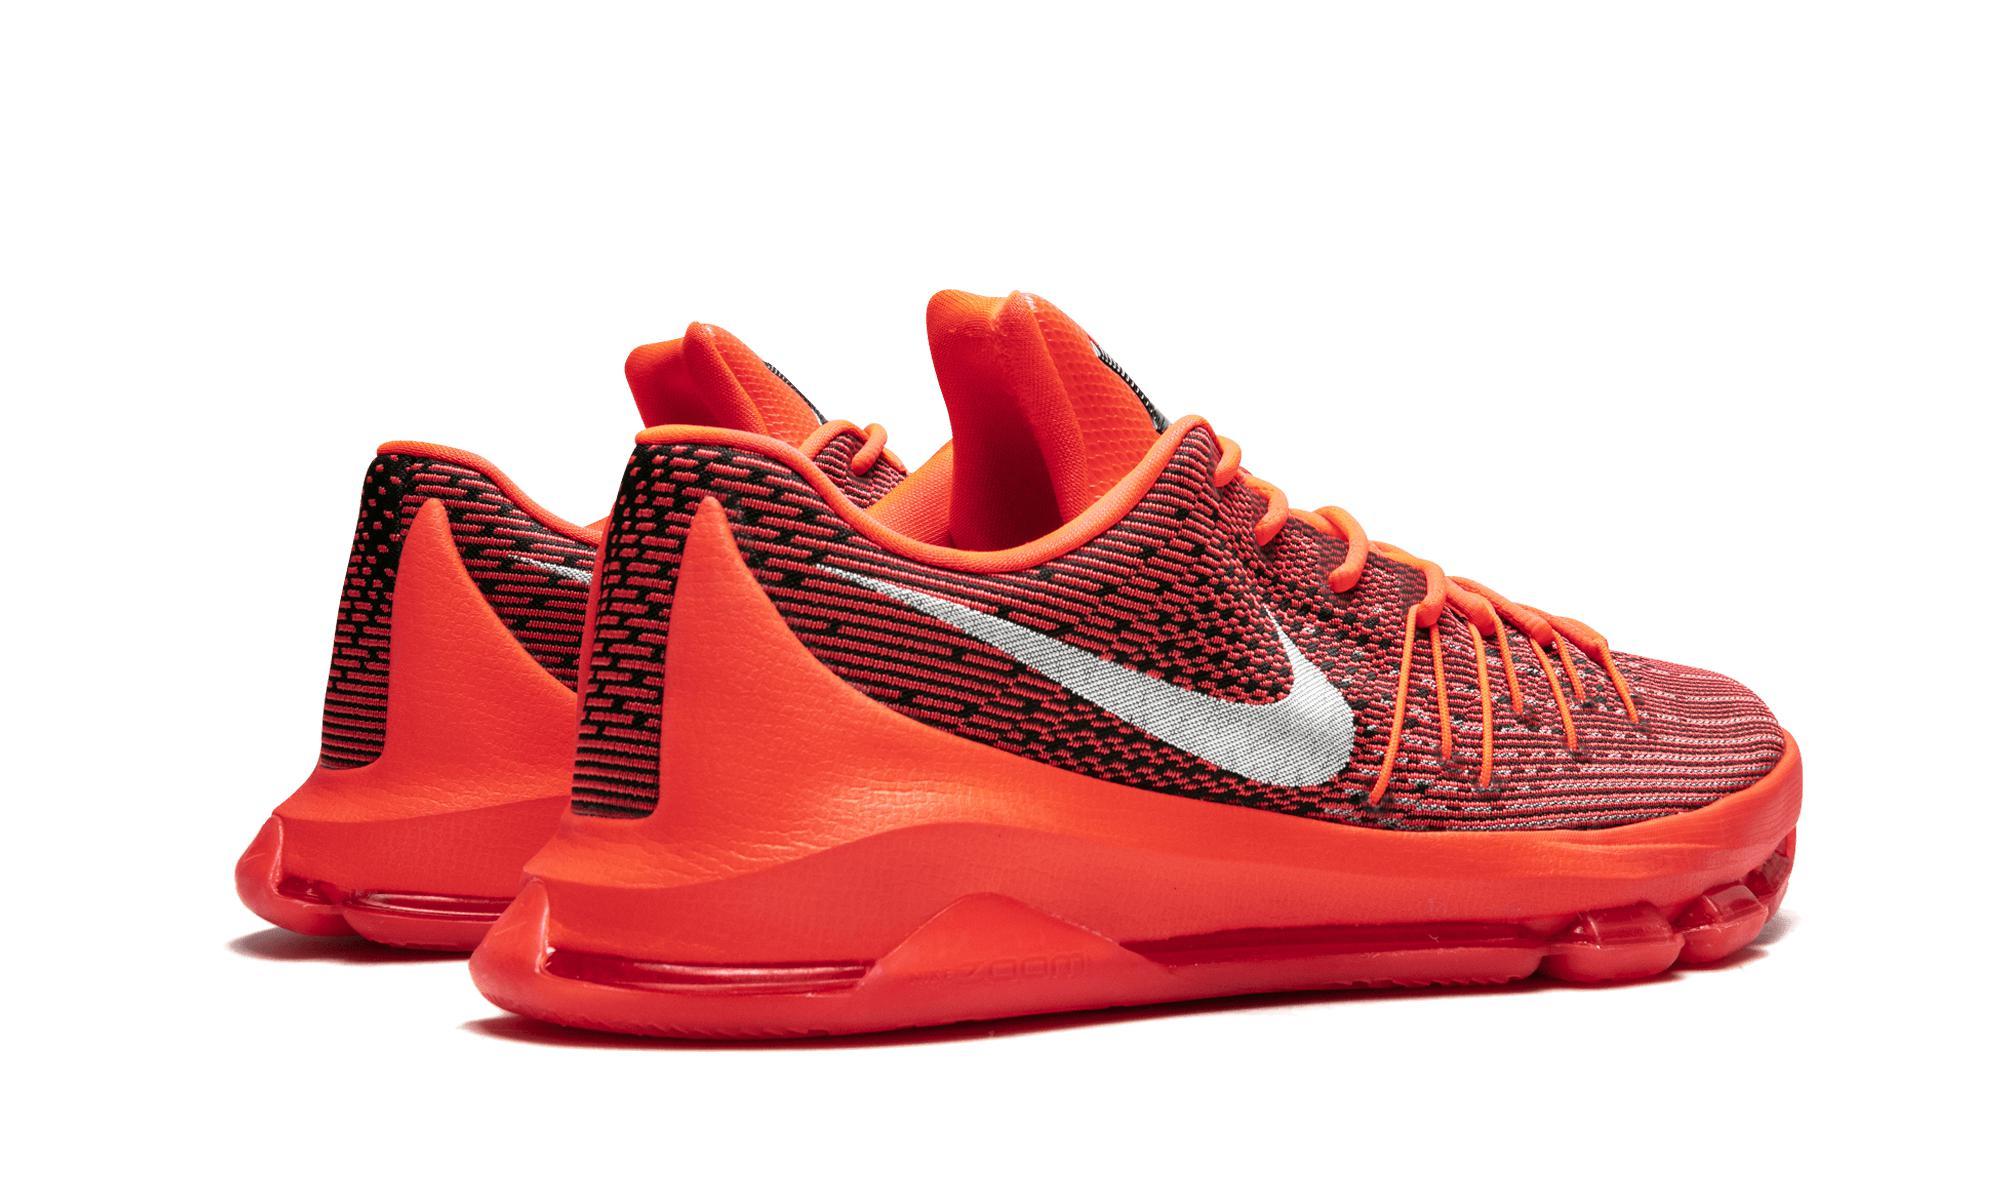 ceb6d201ff85 Nike - Red Kd 8 for Men - Lyst. View fullscreen